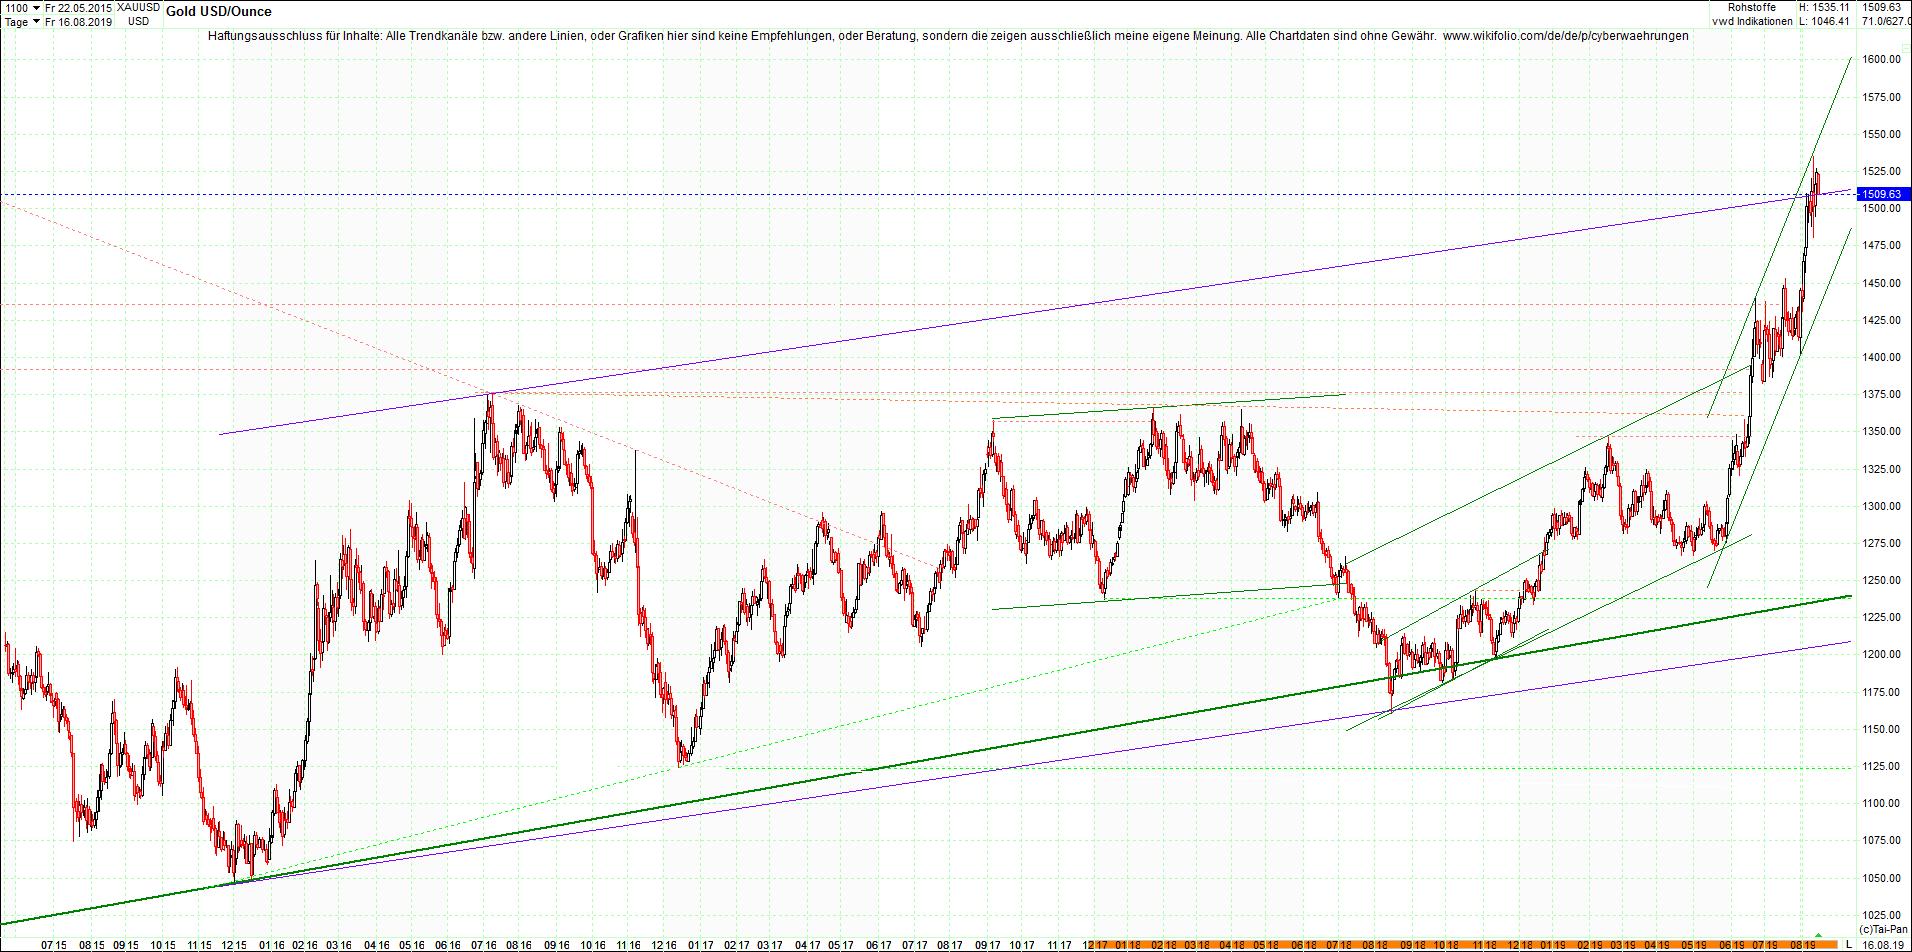 gold_chart_von_heute_morgen.png